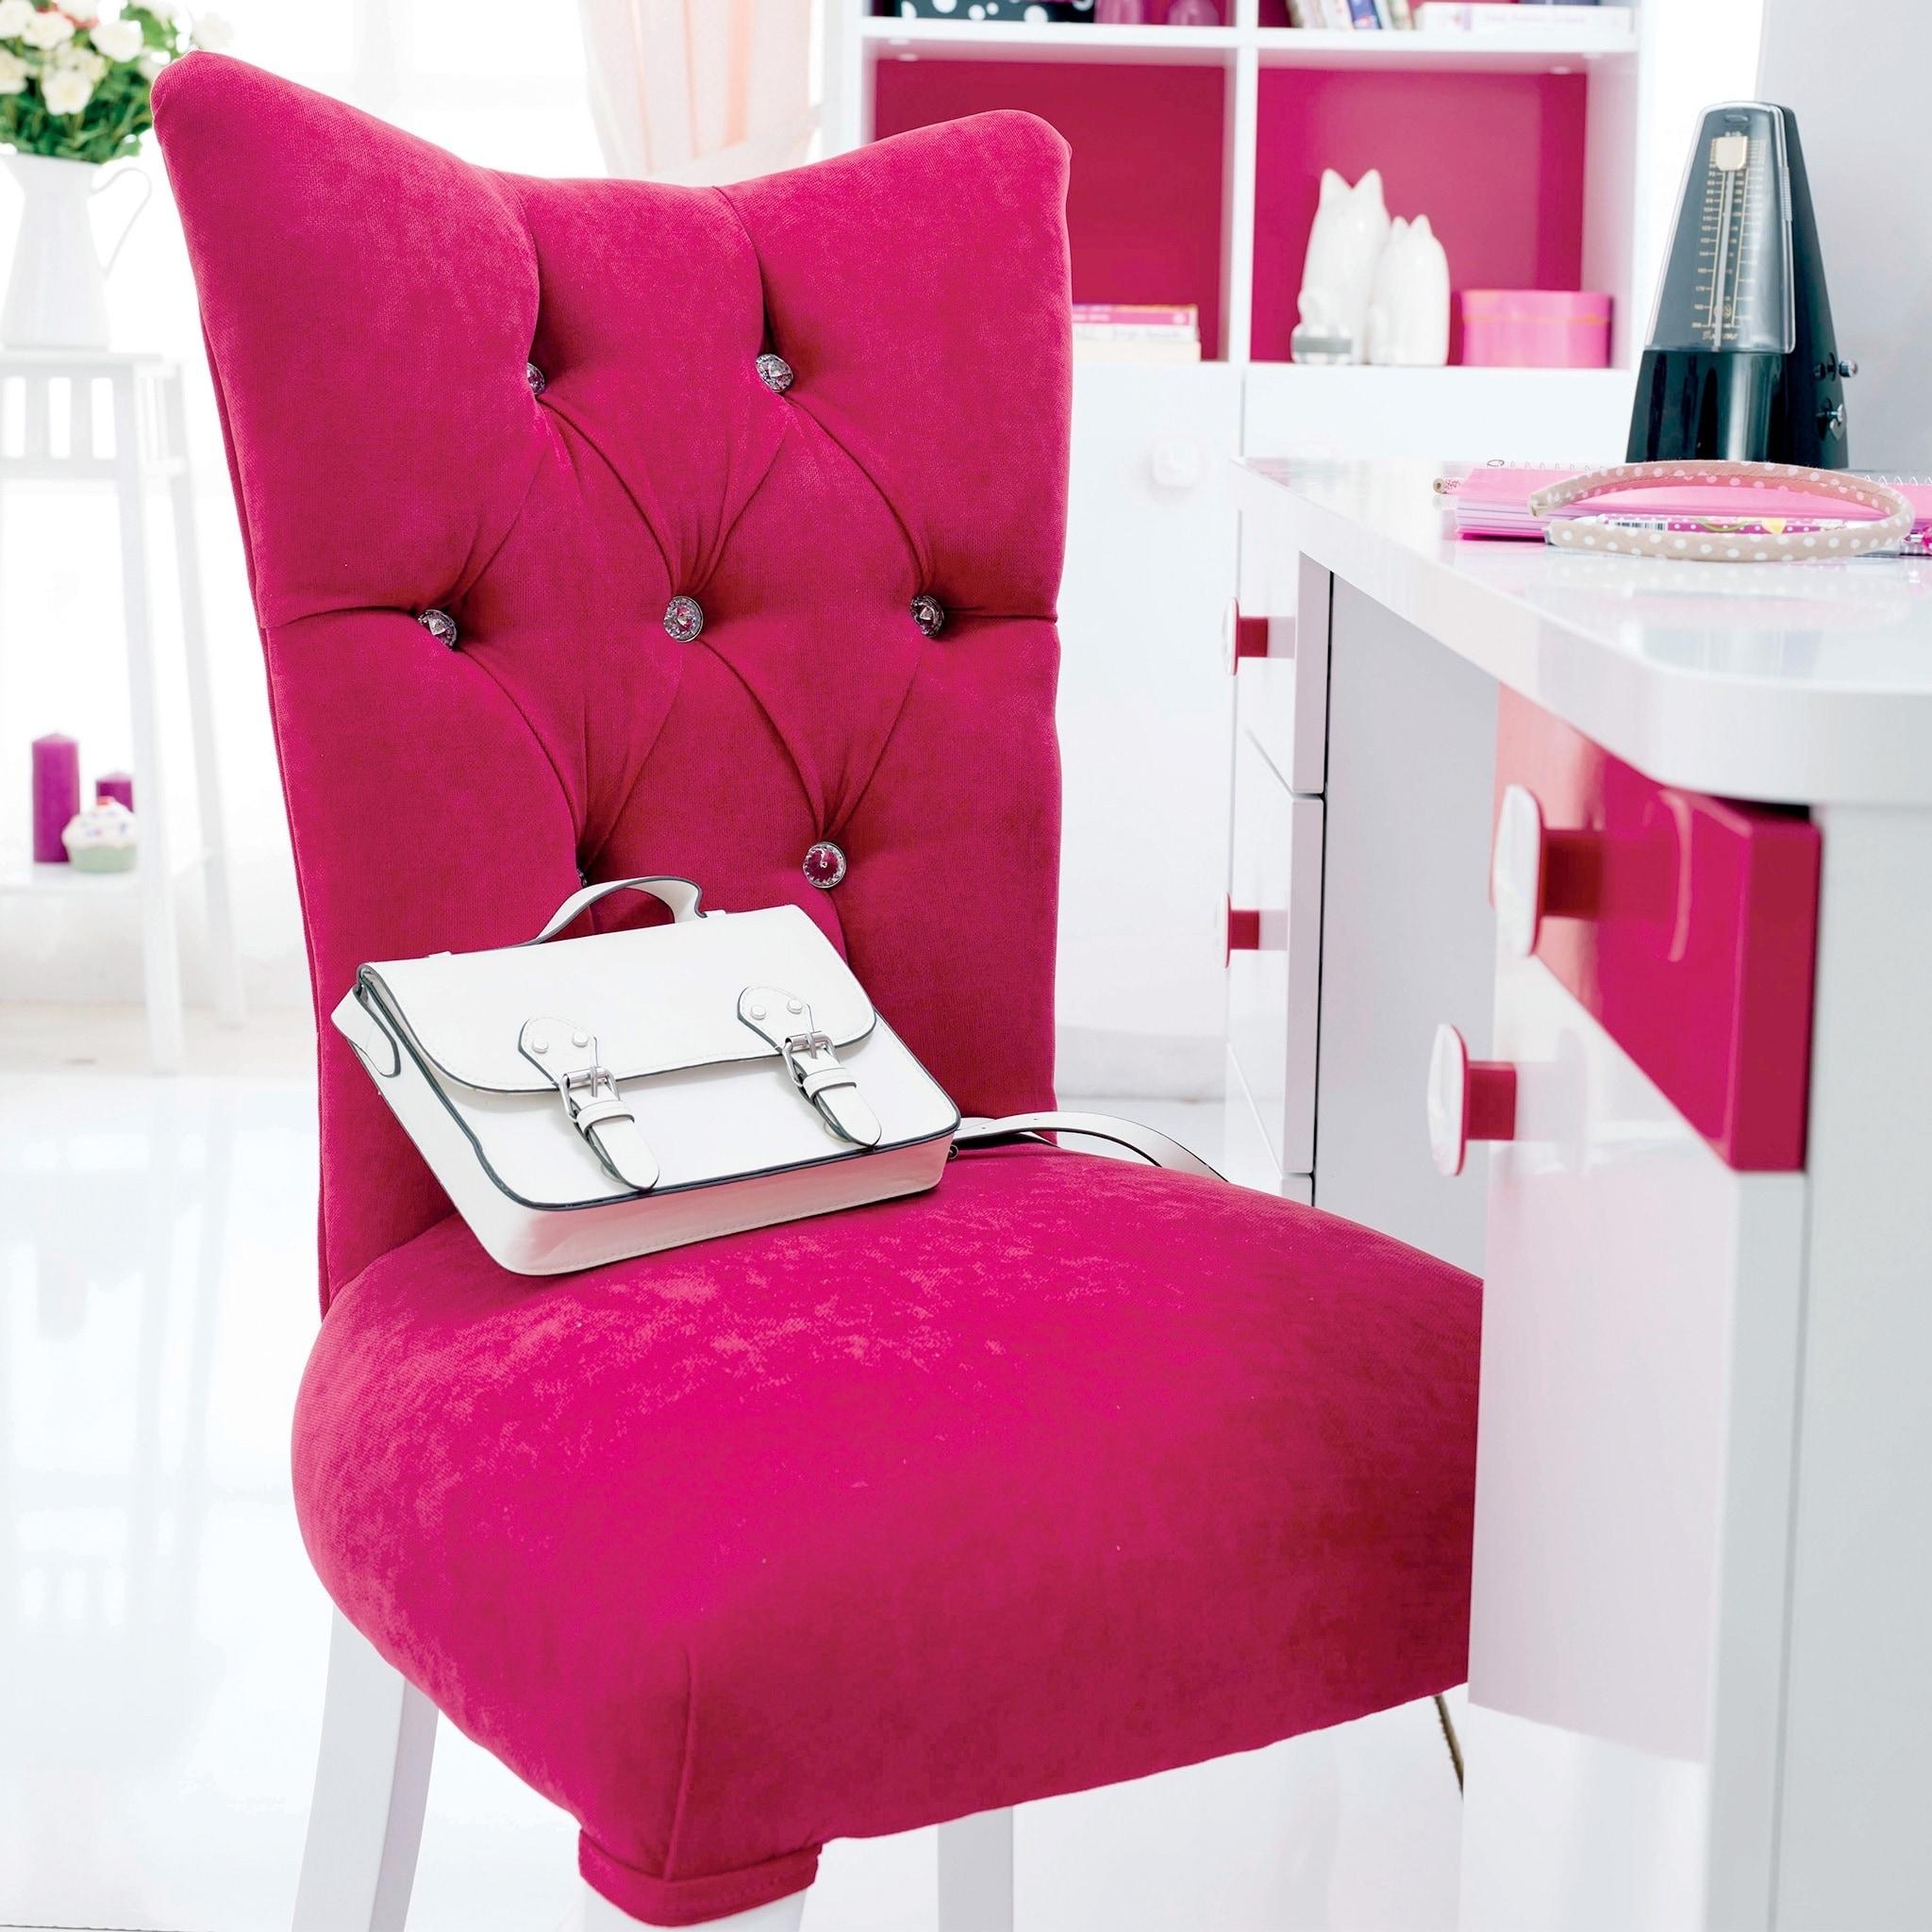 Shop cilek rosa pink velvet upholstered chair free shipping today overstock com 19498865